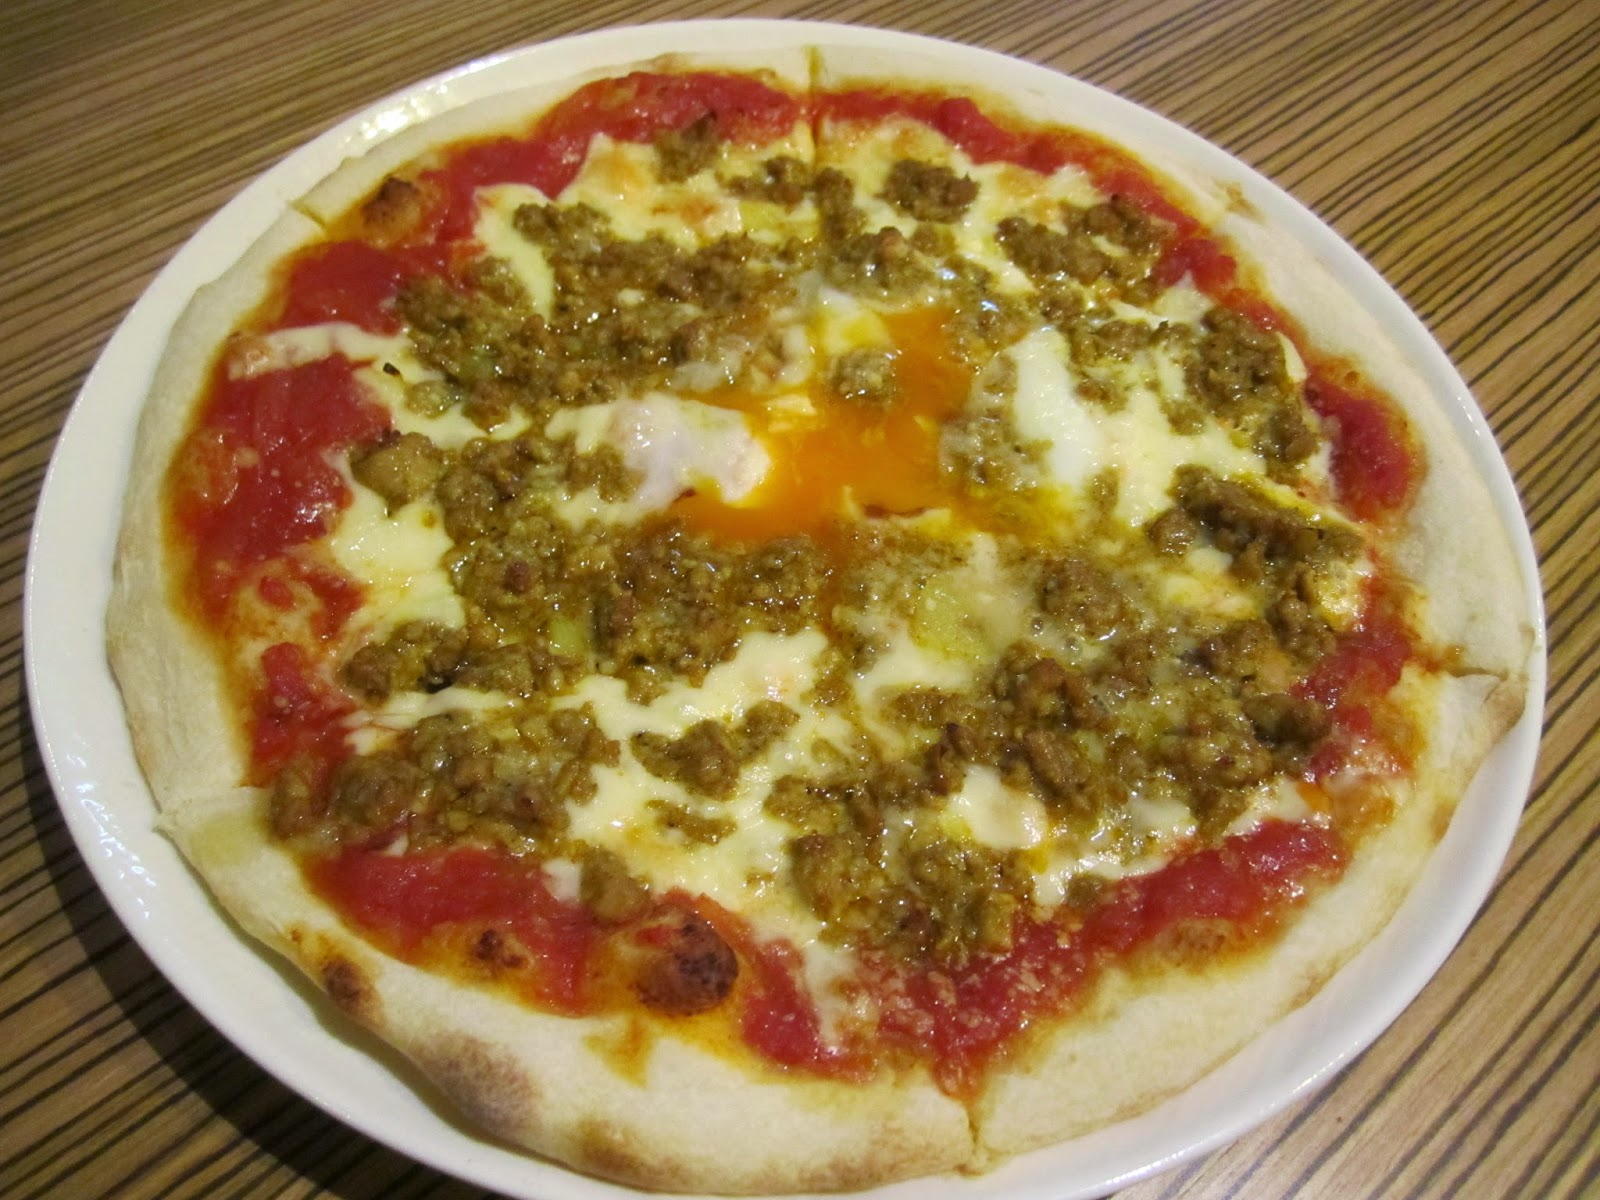 Pizza Sette Colore Towada Italian Bar 気まぐれのピッツァ セッテコローレ イタリアンバー 十和田市